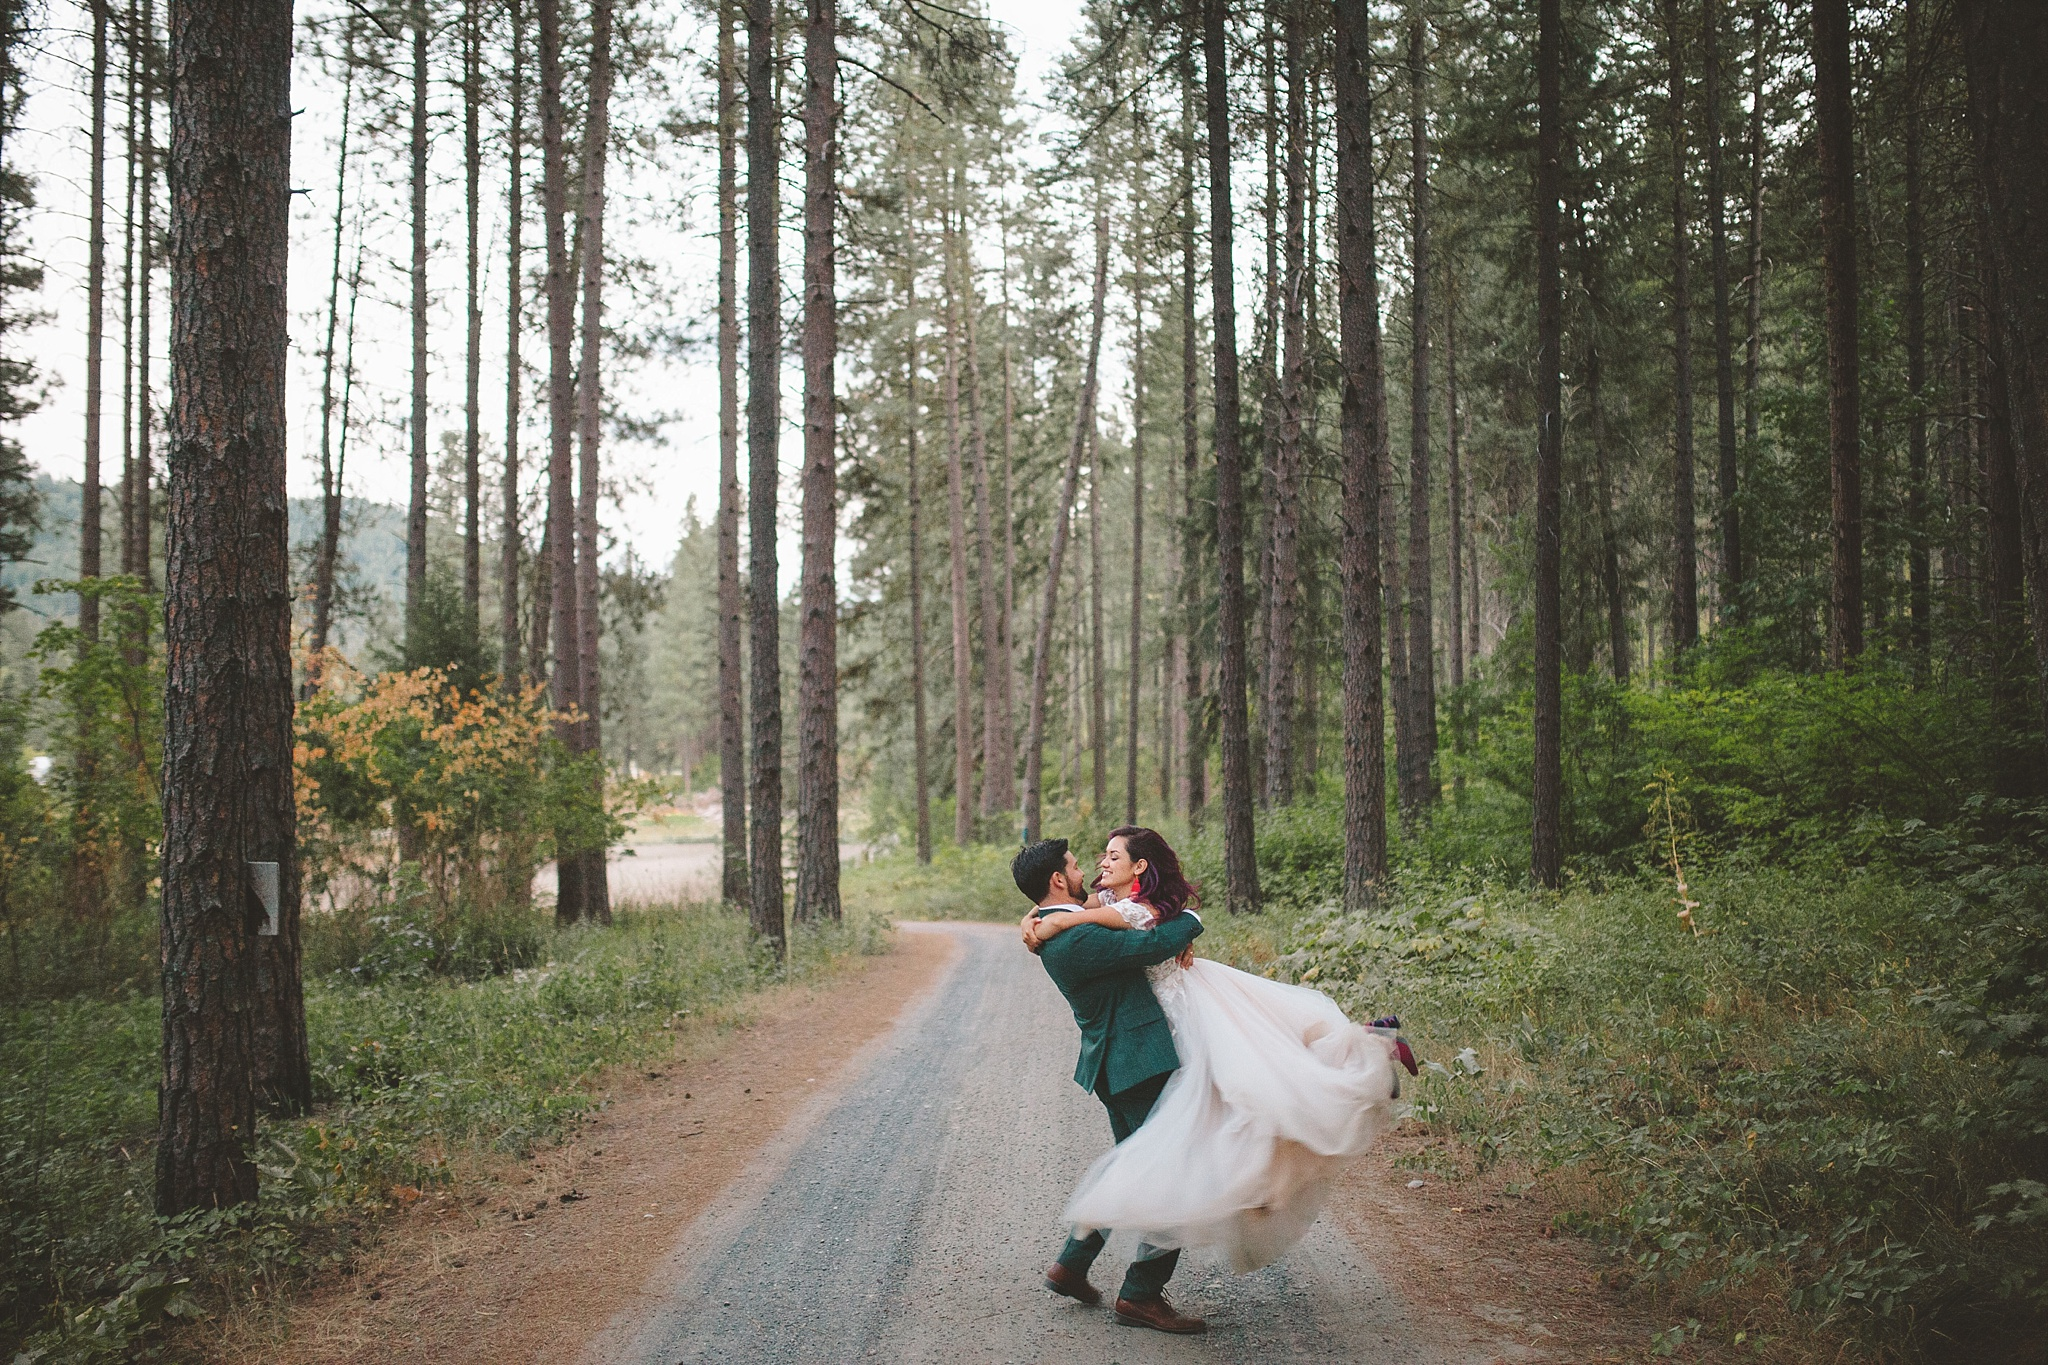 couple dances in woods for wedding